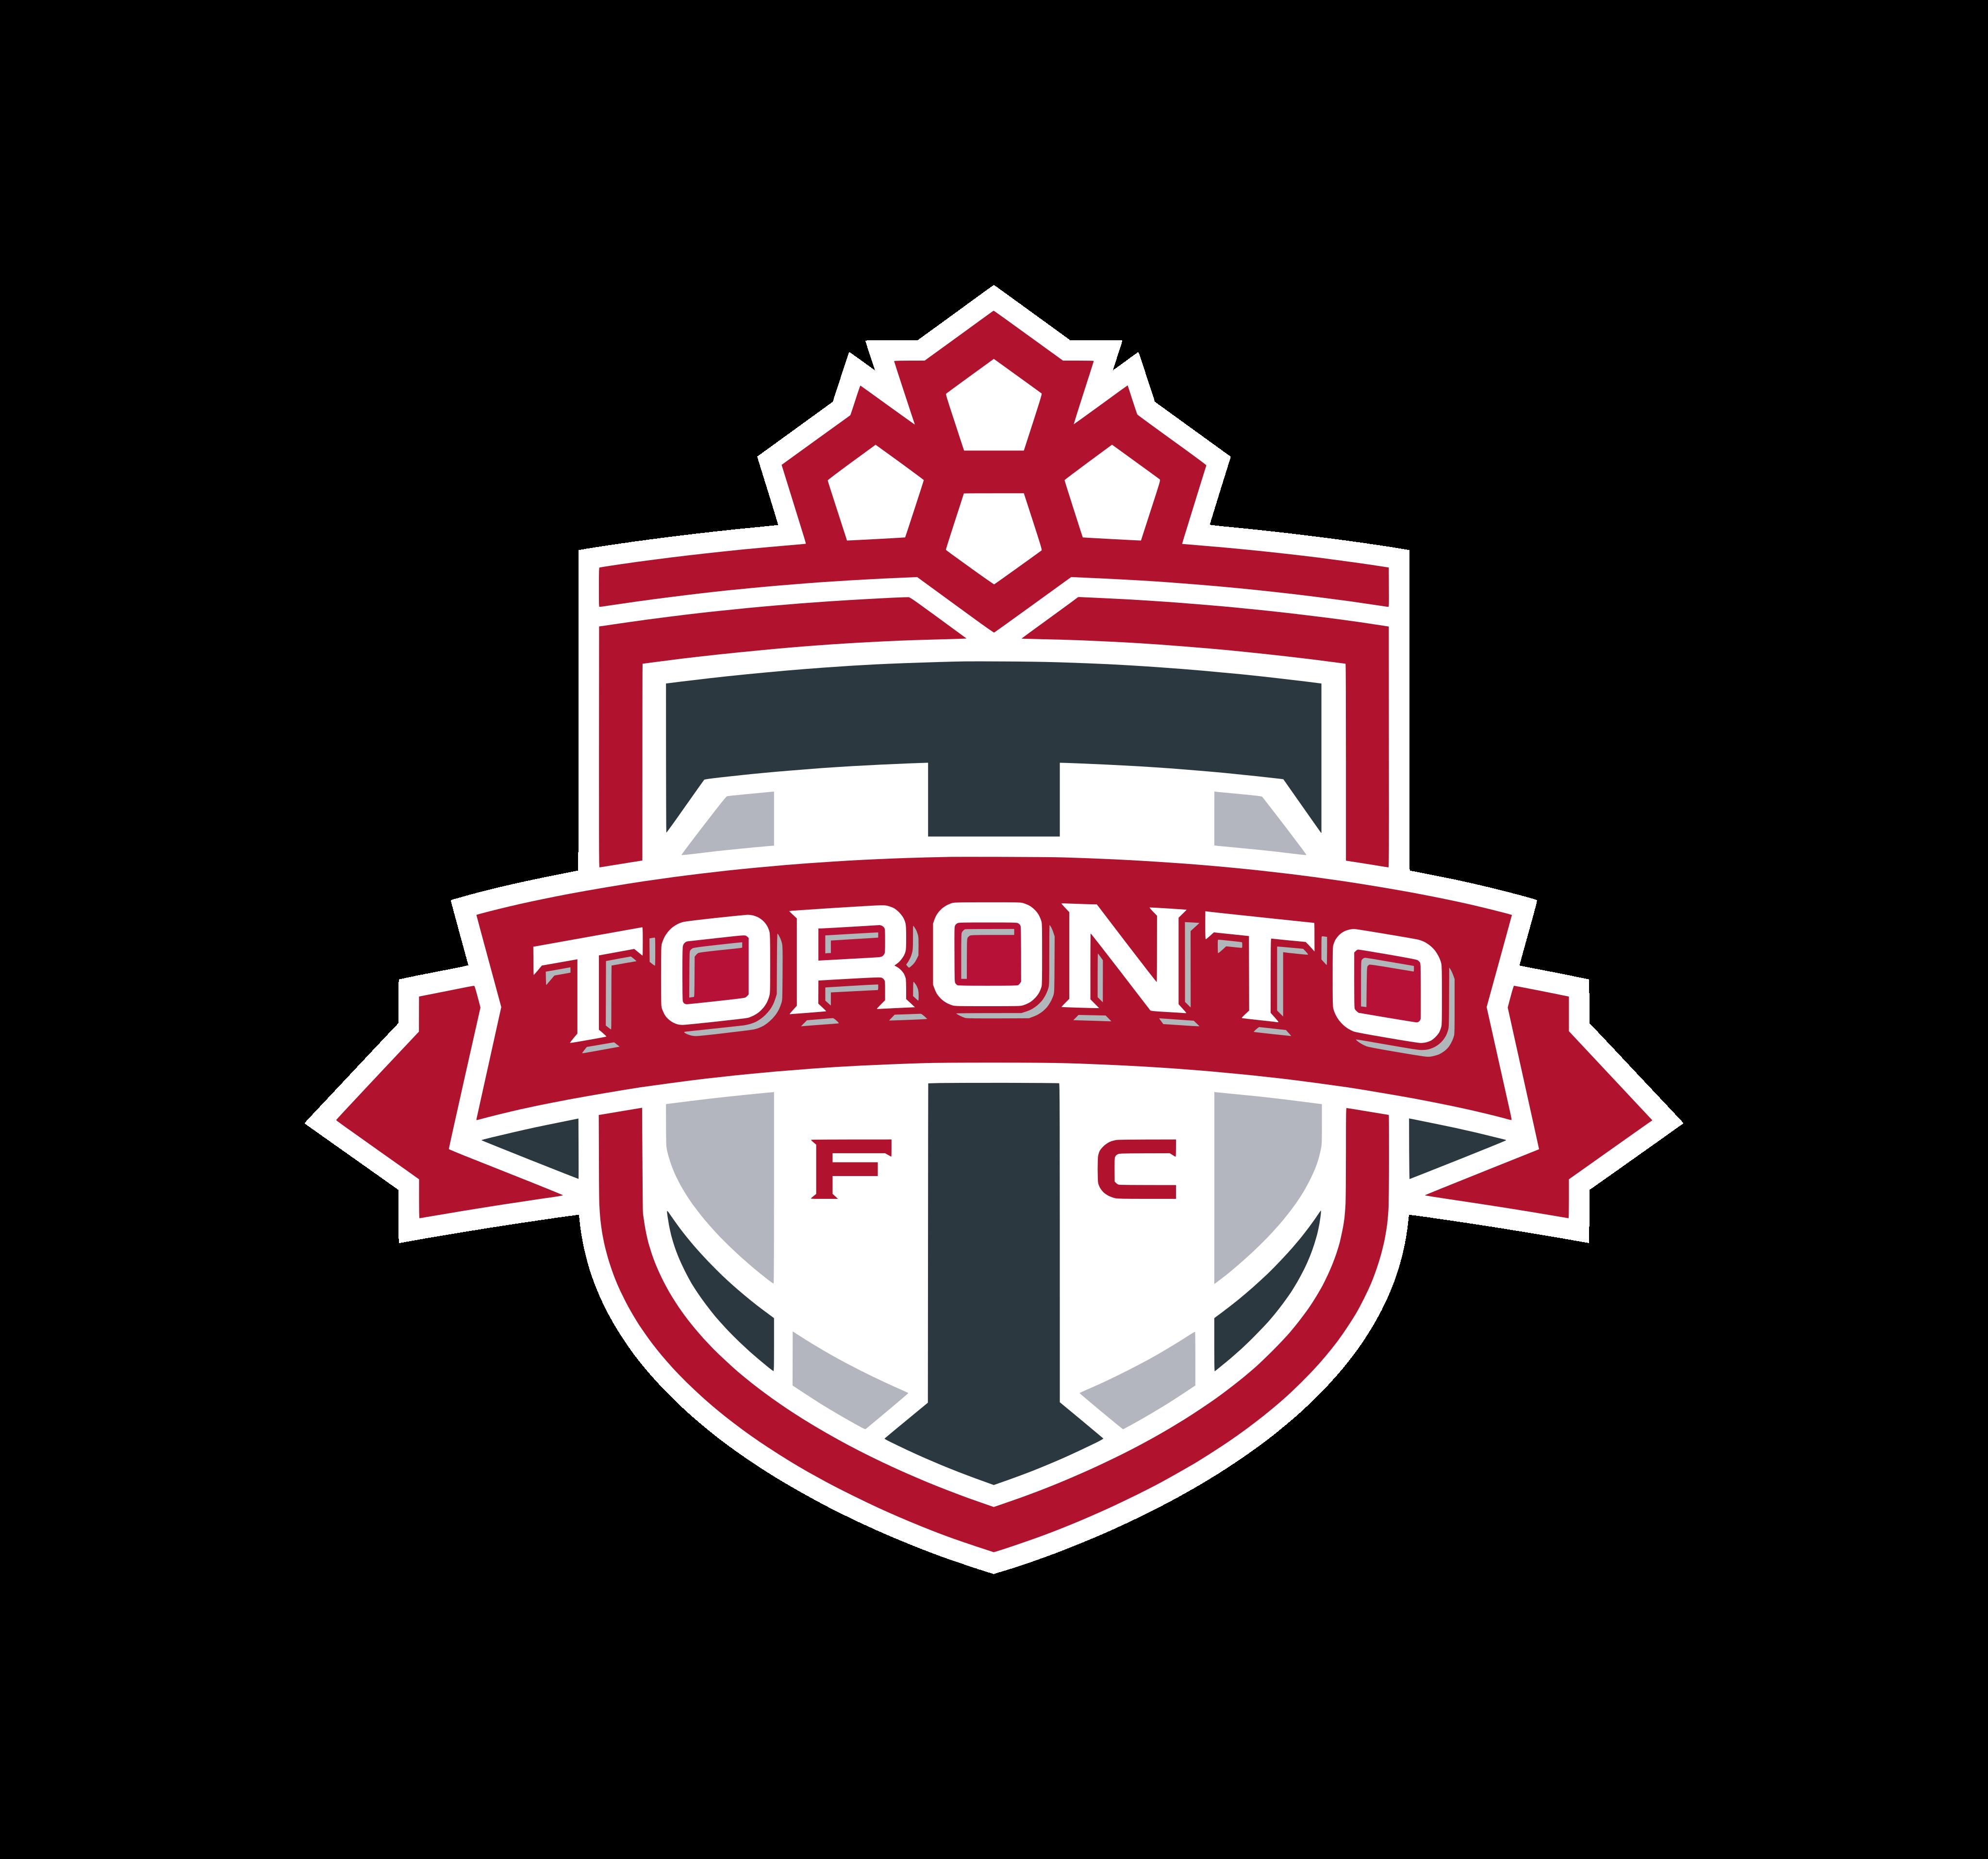 toronto fc logo 0 - Toronto FC Logo